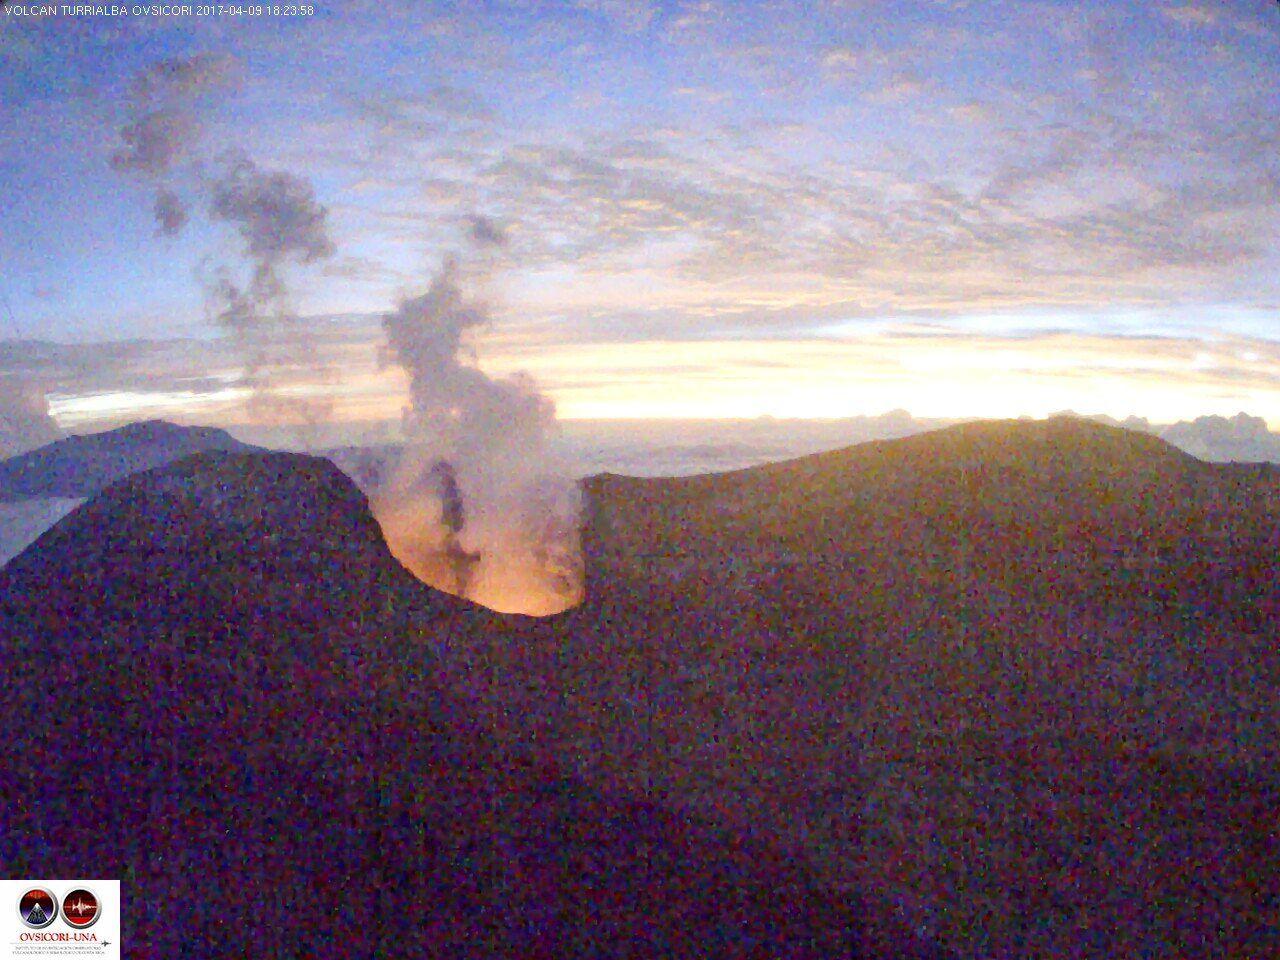 Turrialba - incandescence dans la cratère le 09.04.2017 / 18h24 - webcam Ovsicori